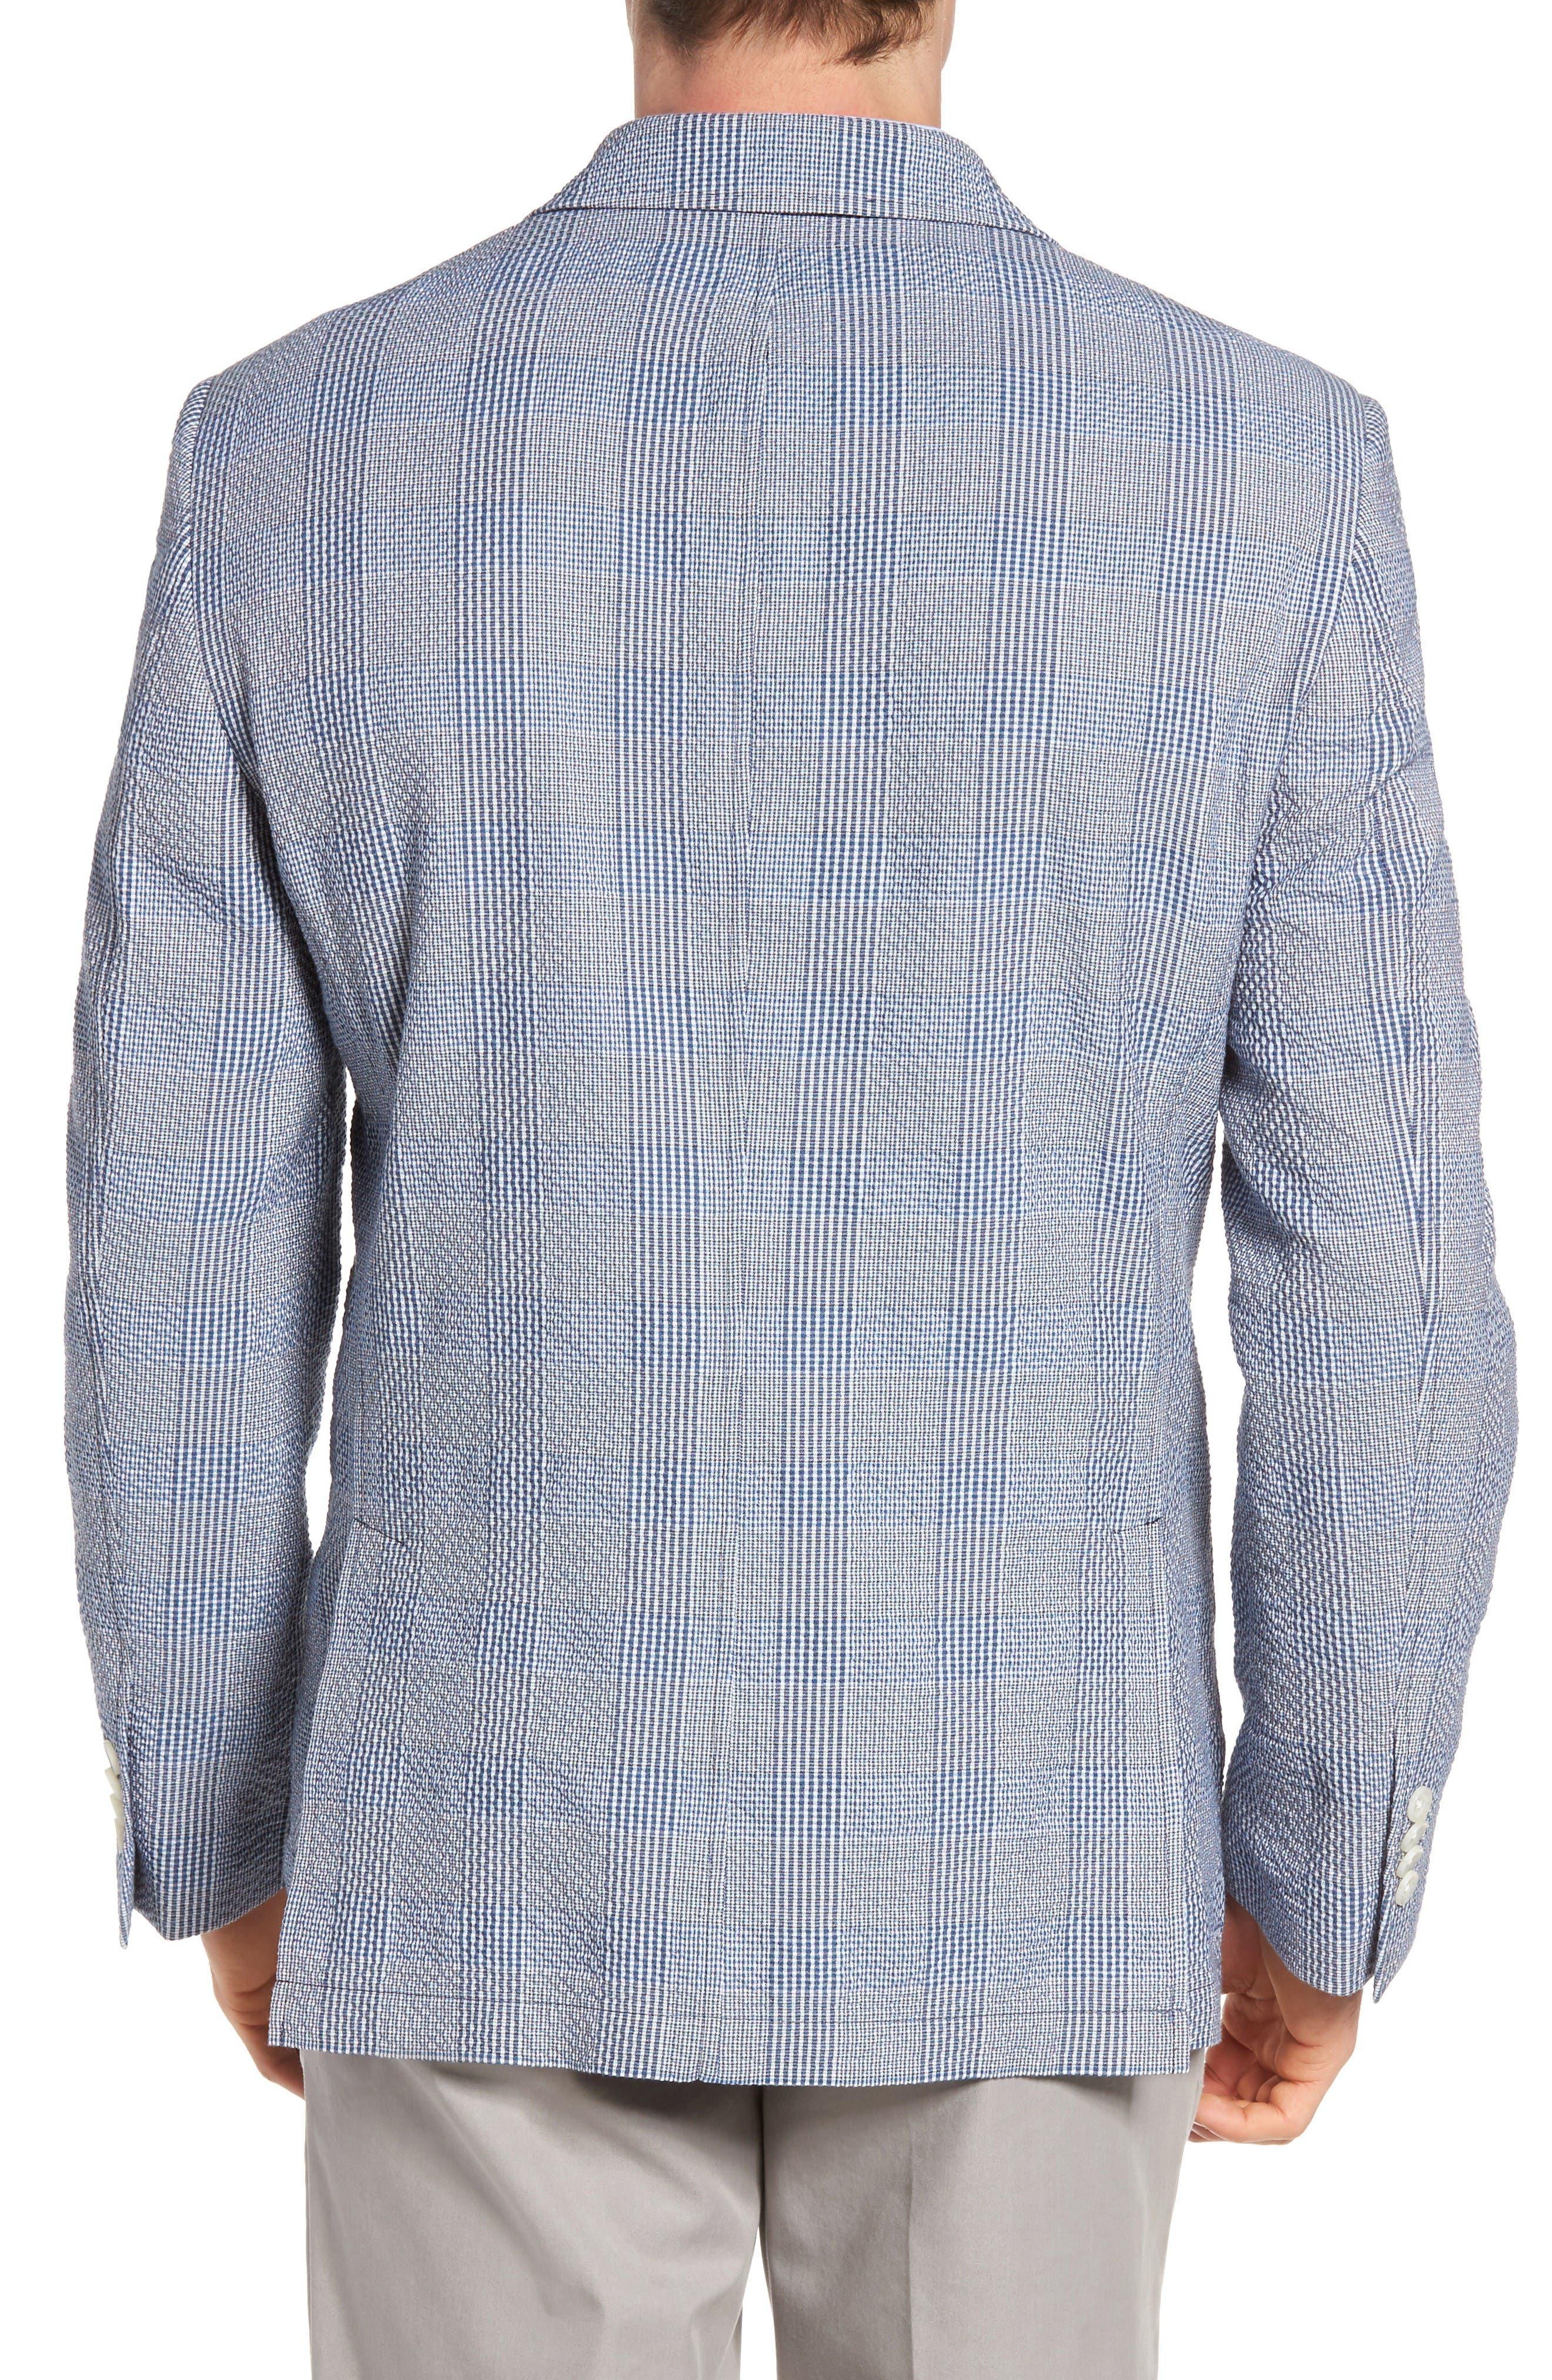 Babbitt Plaid Seersucker Sport Coat,                             Alternate thumbnail 2, color,                             Blue